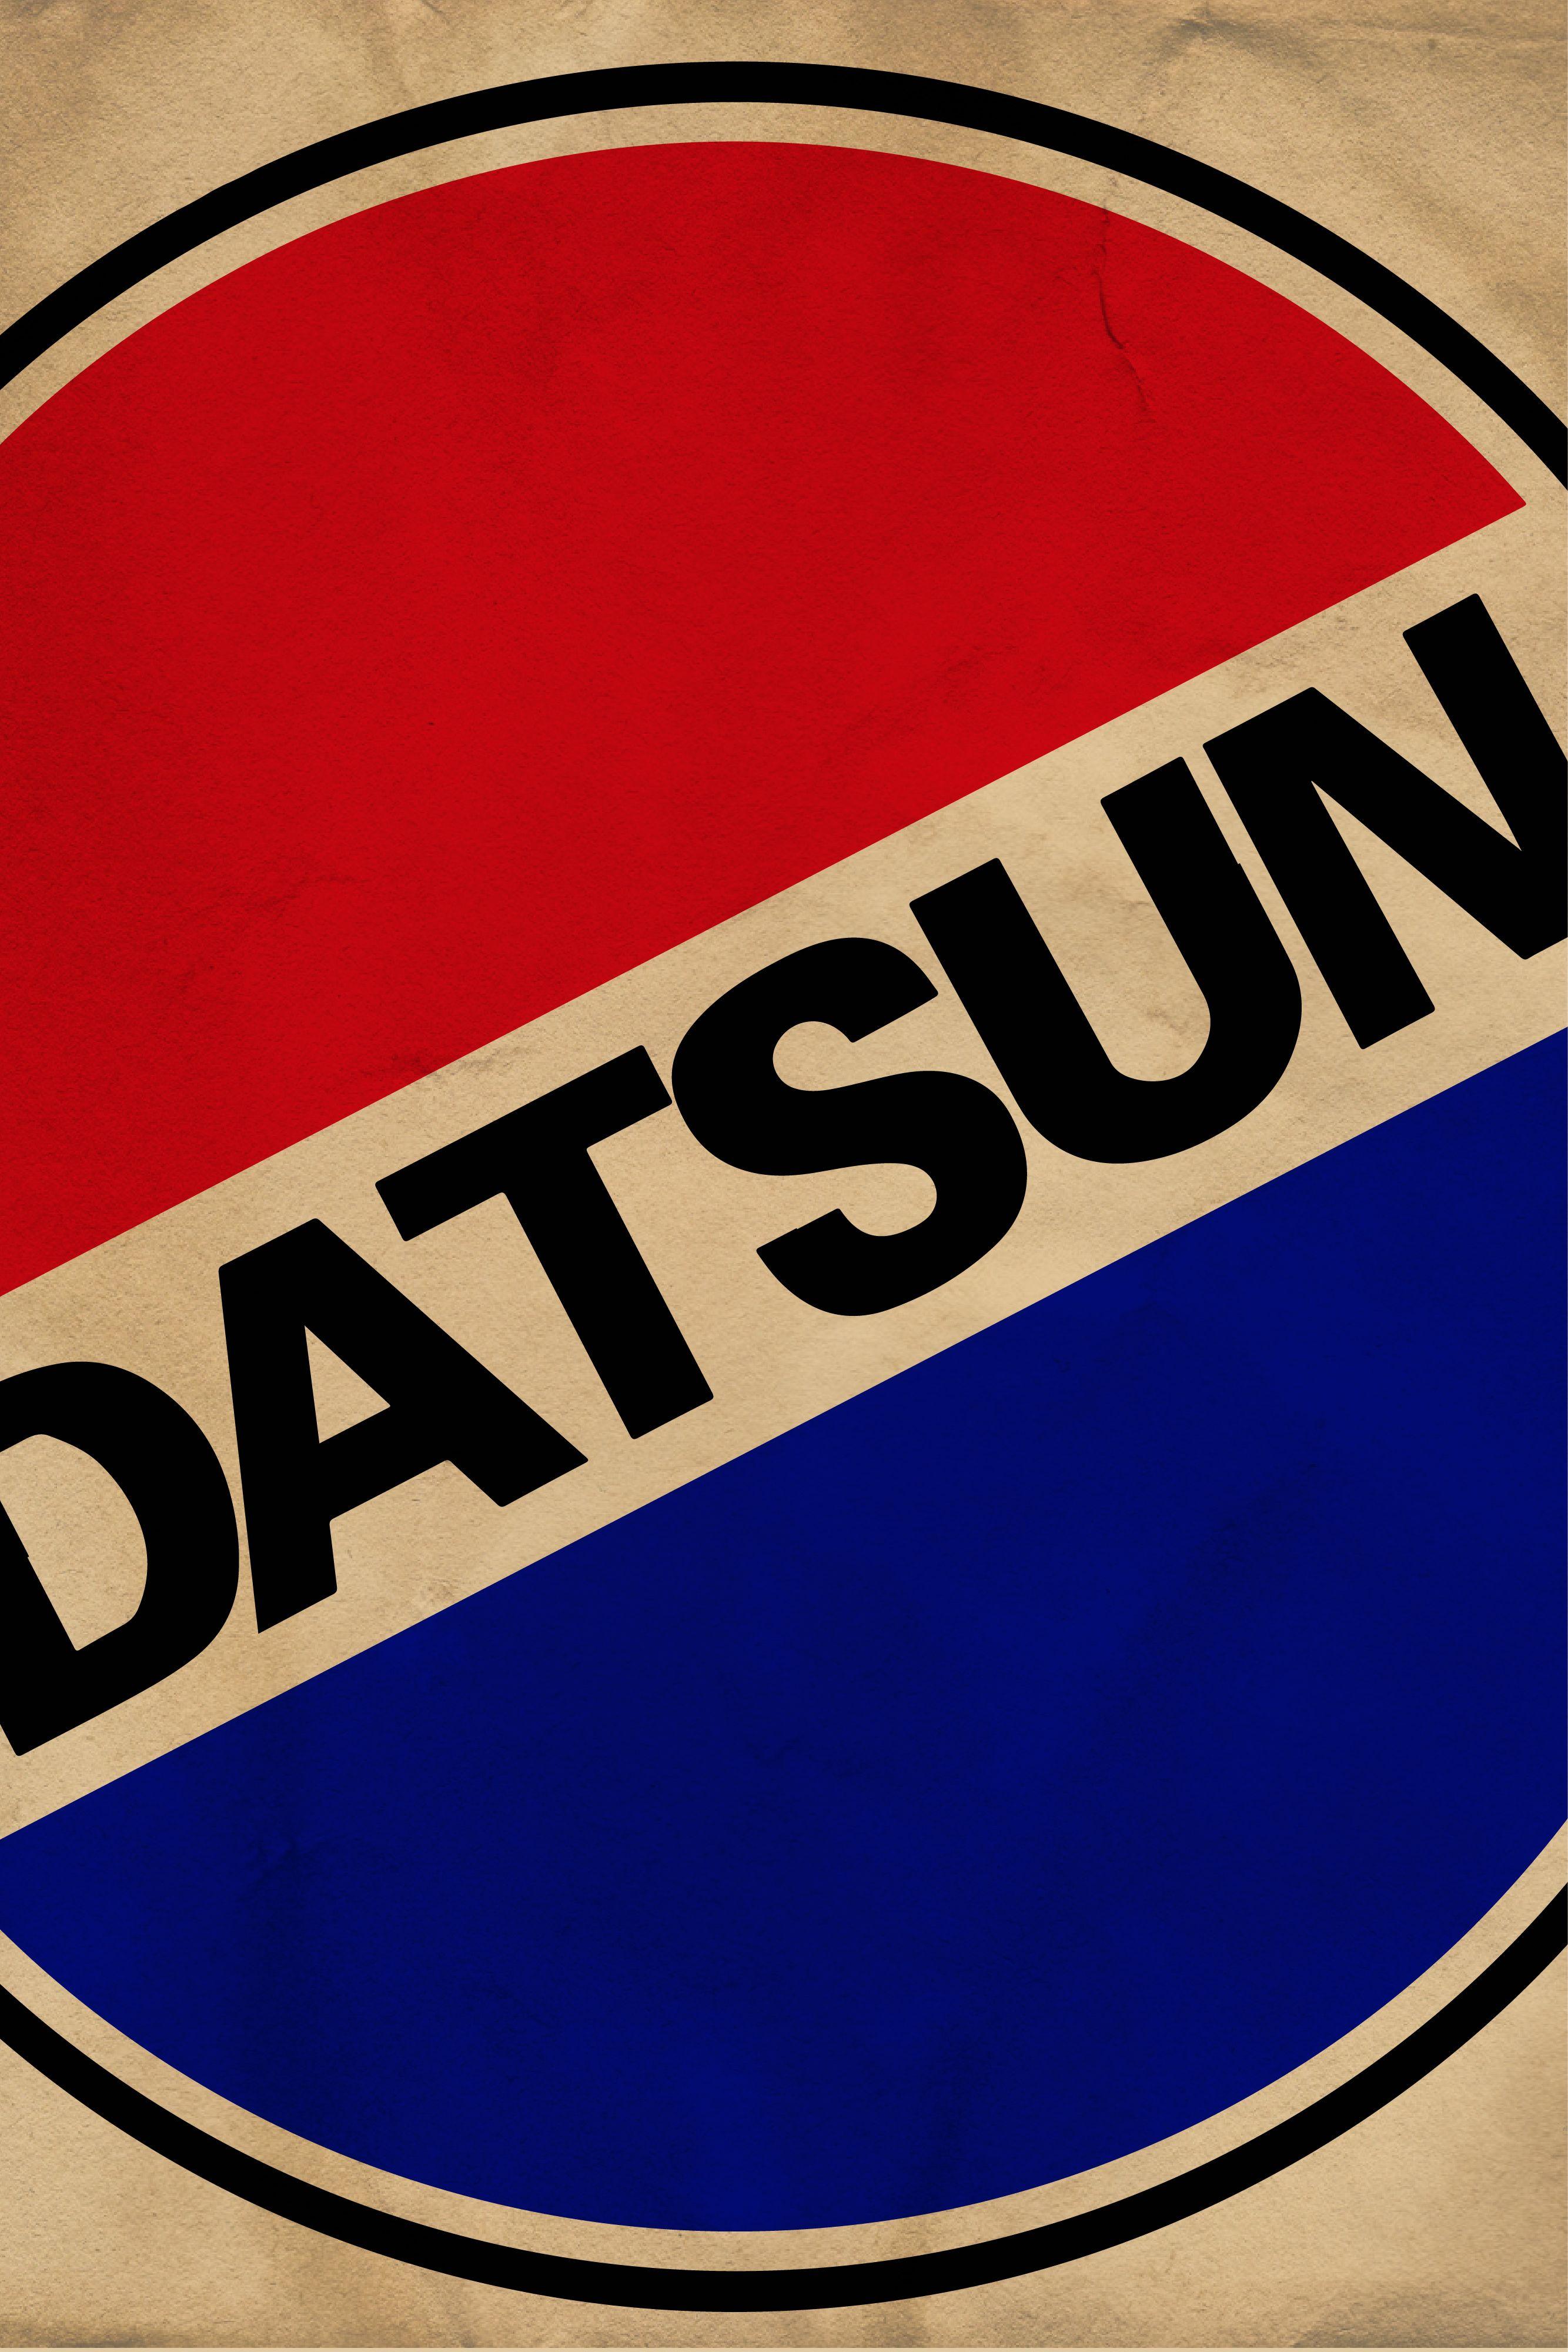 iPhone Wallpaper Project Datsun Logo Datsun 510